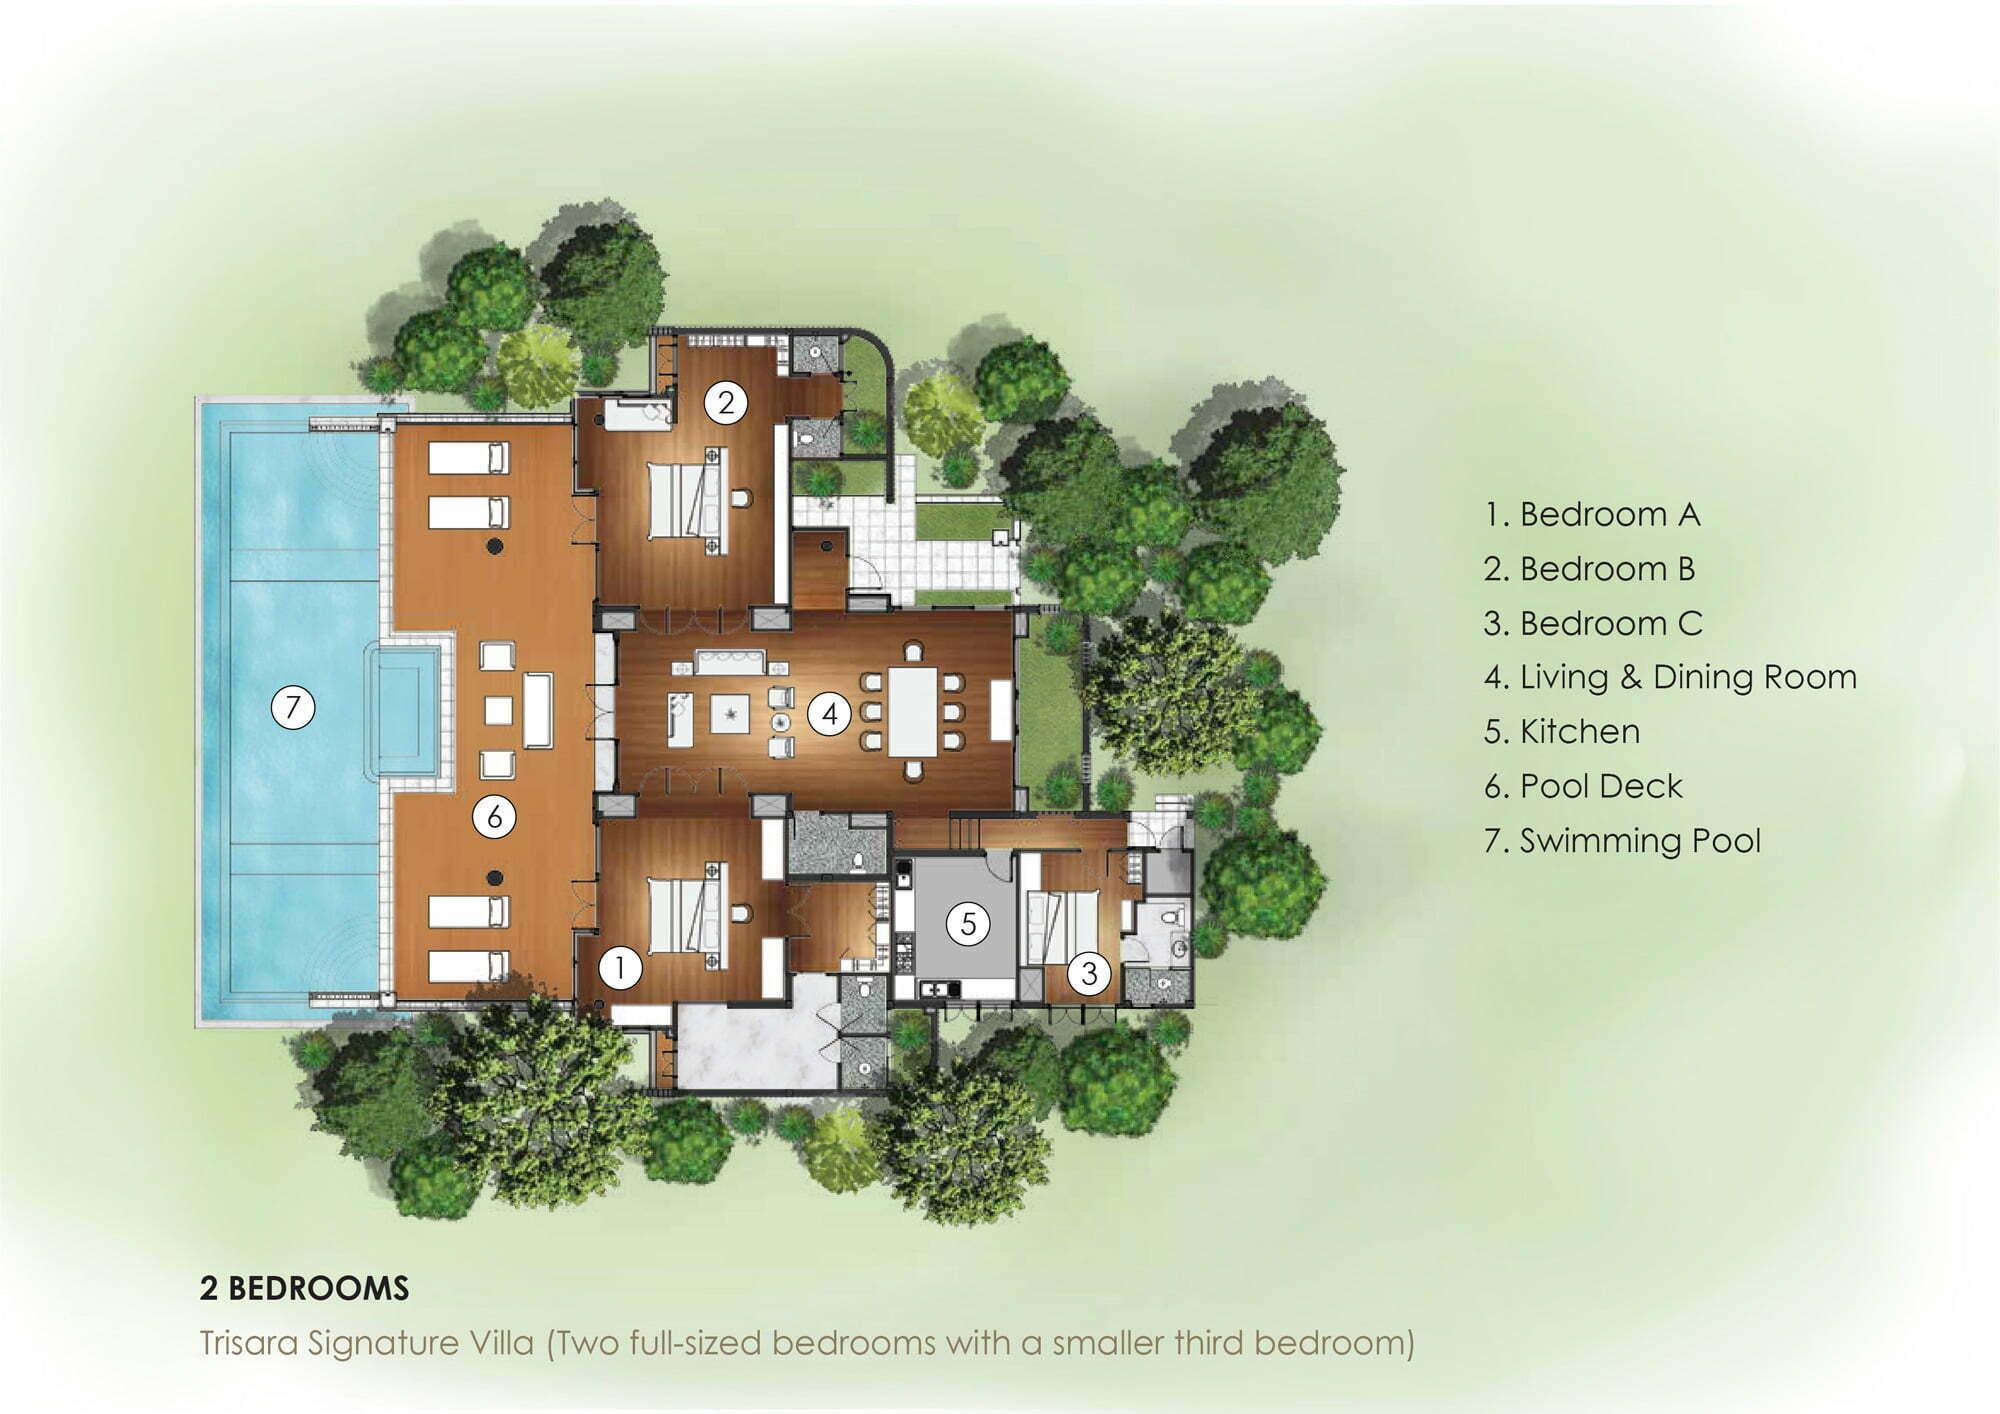 2Bedroom-Trisara Signature Villa with Third Bedroom